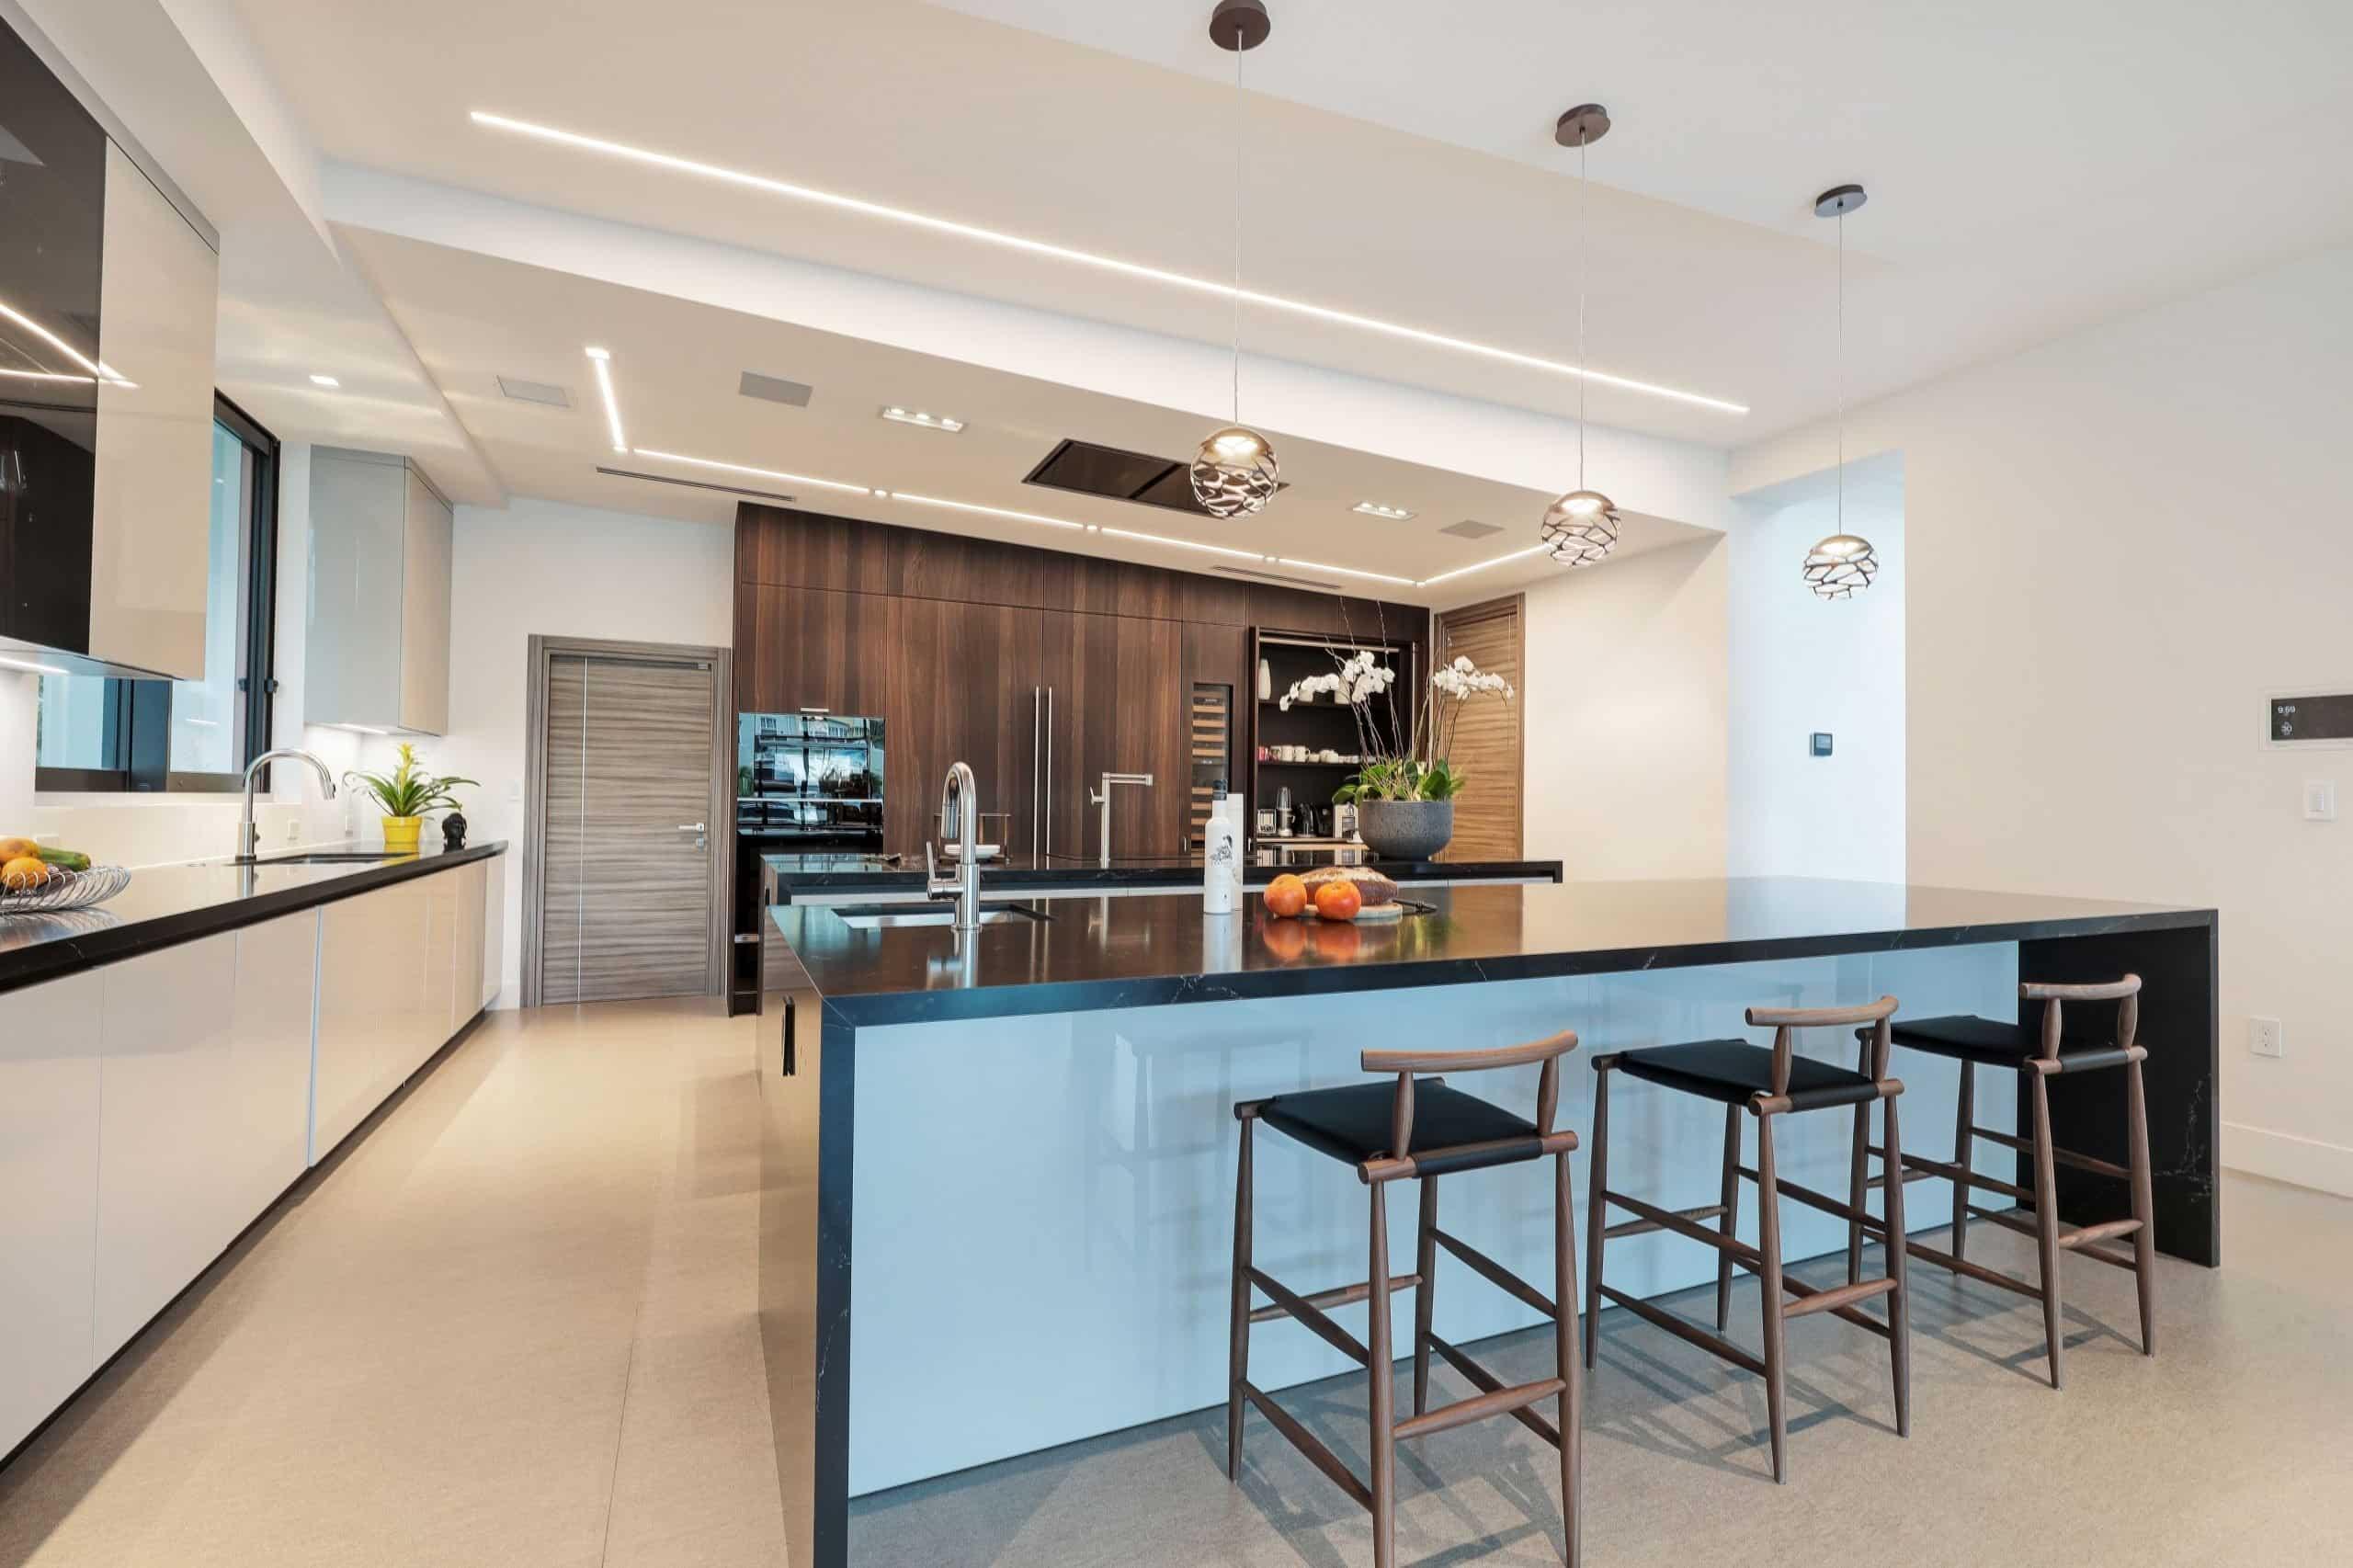 linea studio Coral Ridge Fort Lauderdale FL - 2019